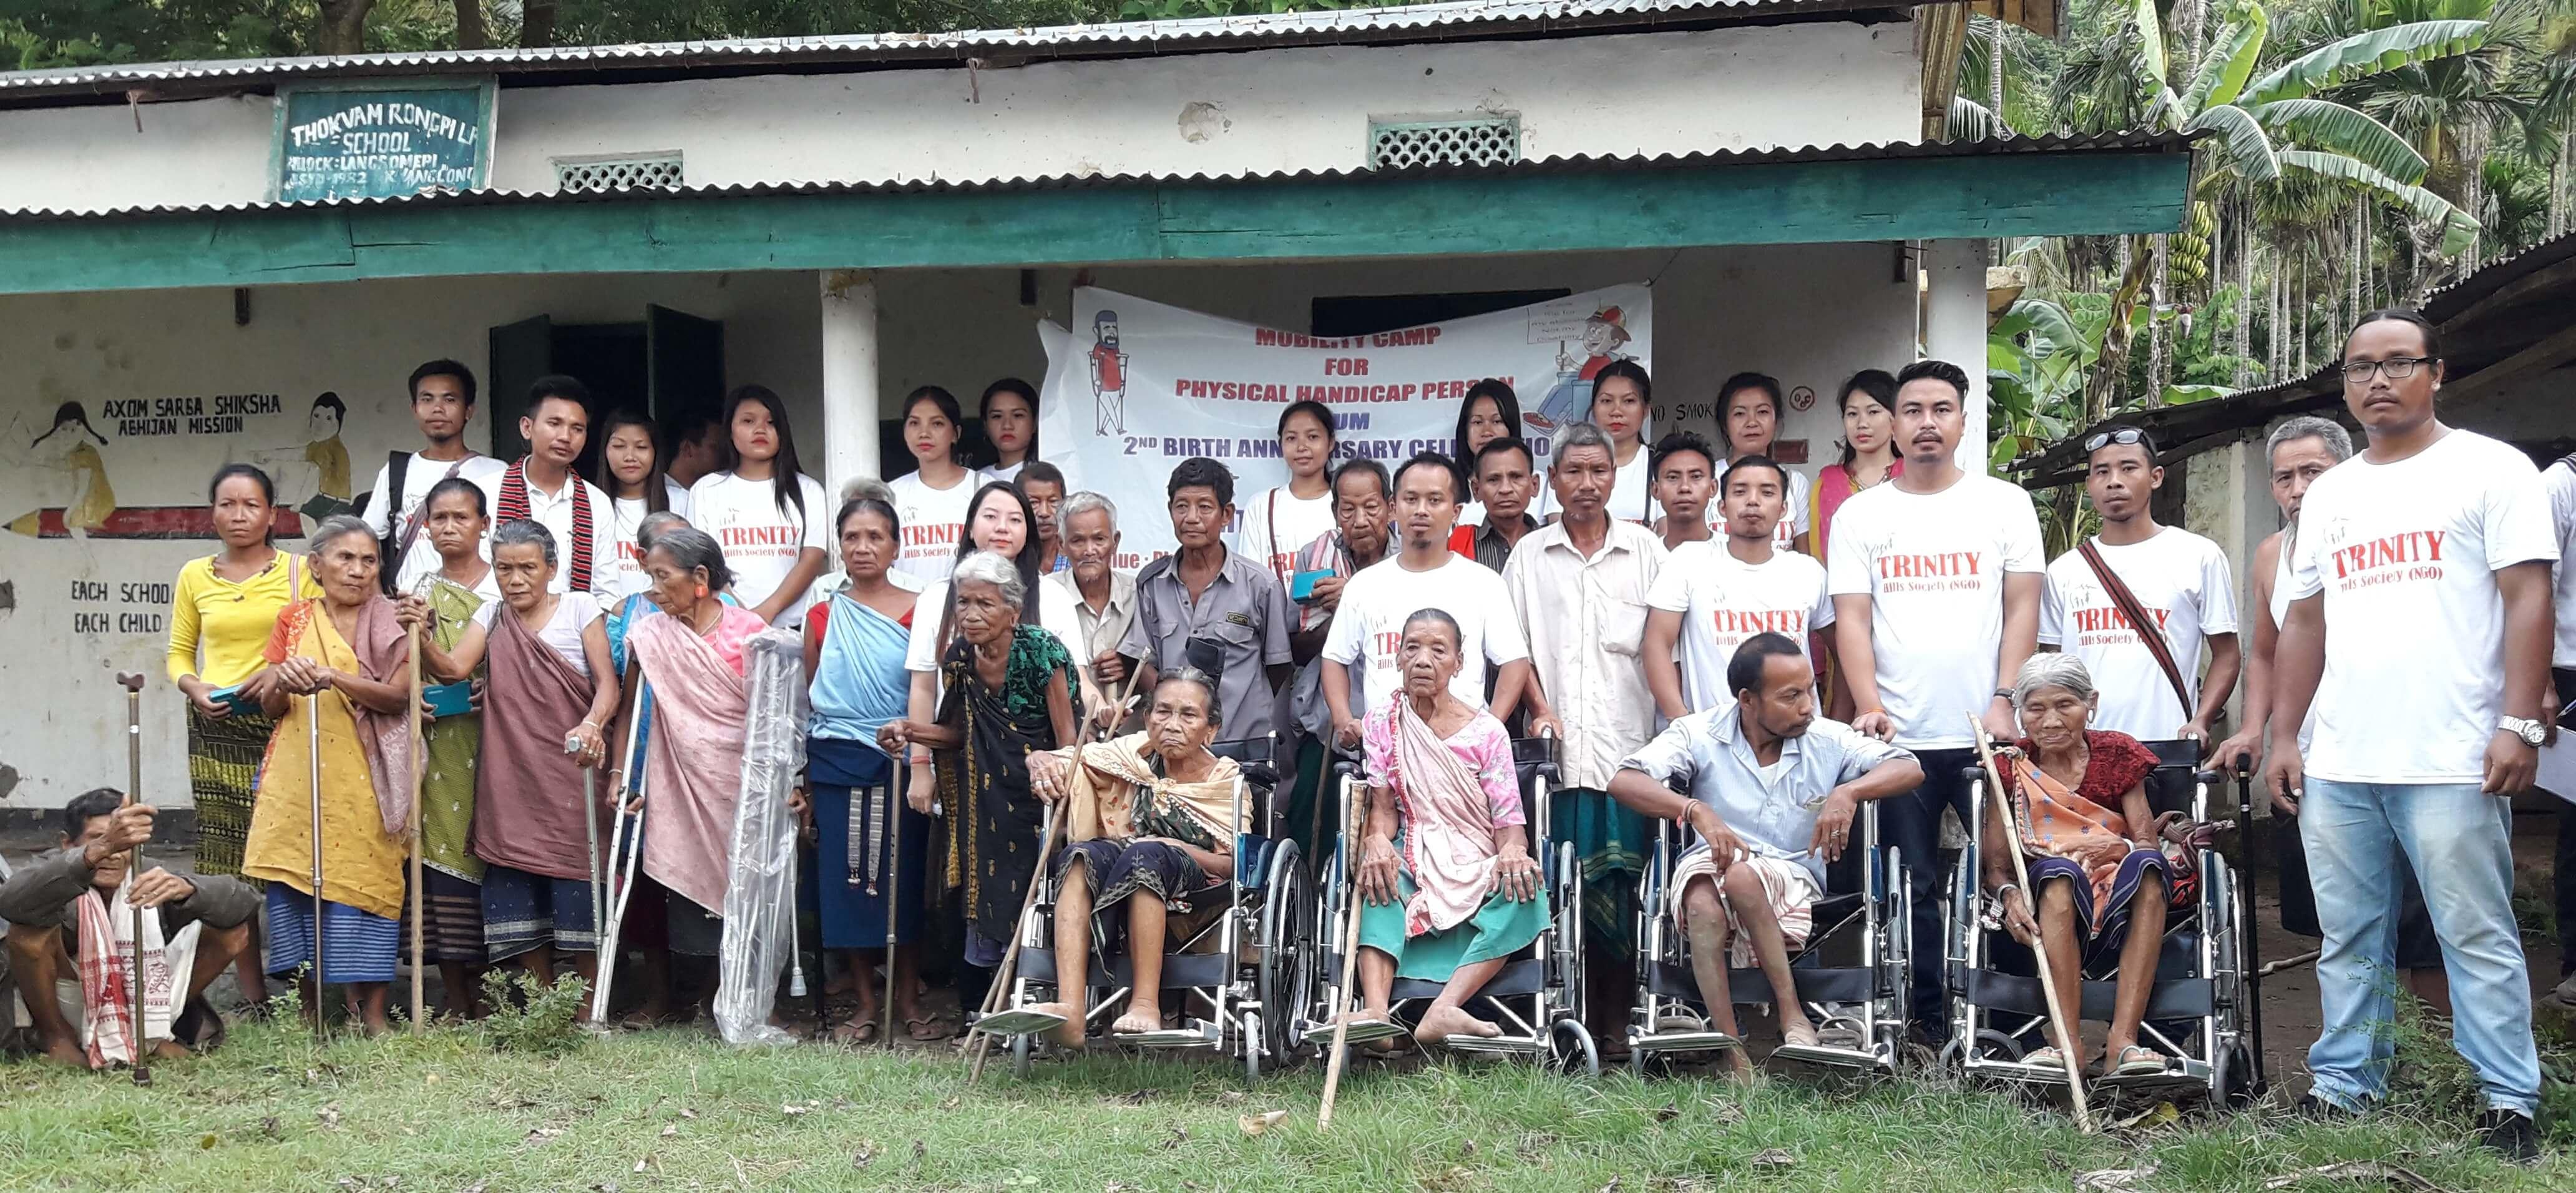 Trinity Hills Society Celebrates Second Foundation Day at Pholoni Thongvam Rongpi LP School on Tuesday